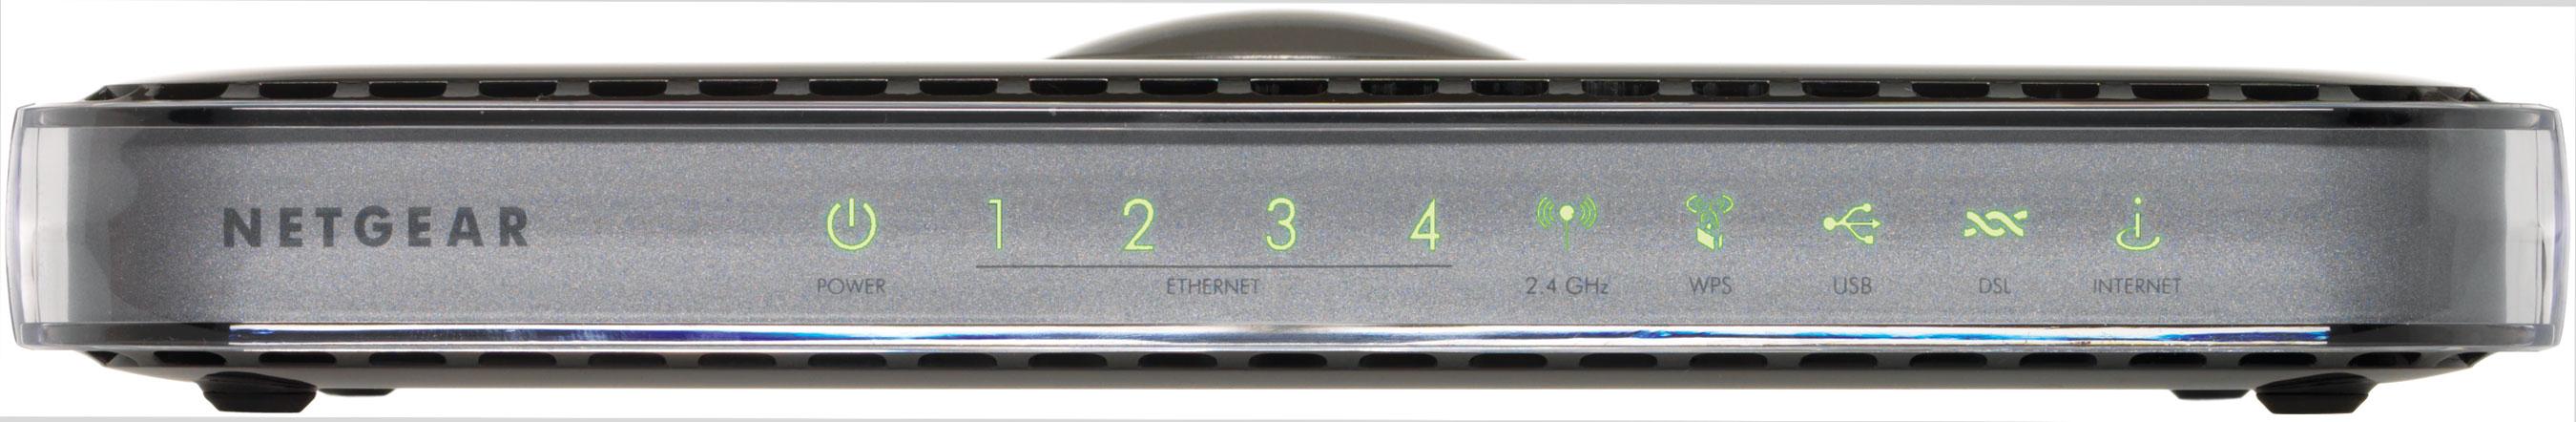 Netgear DGN3500 Nero router wireless